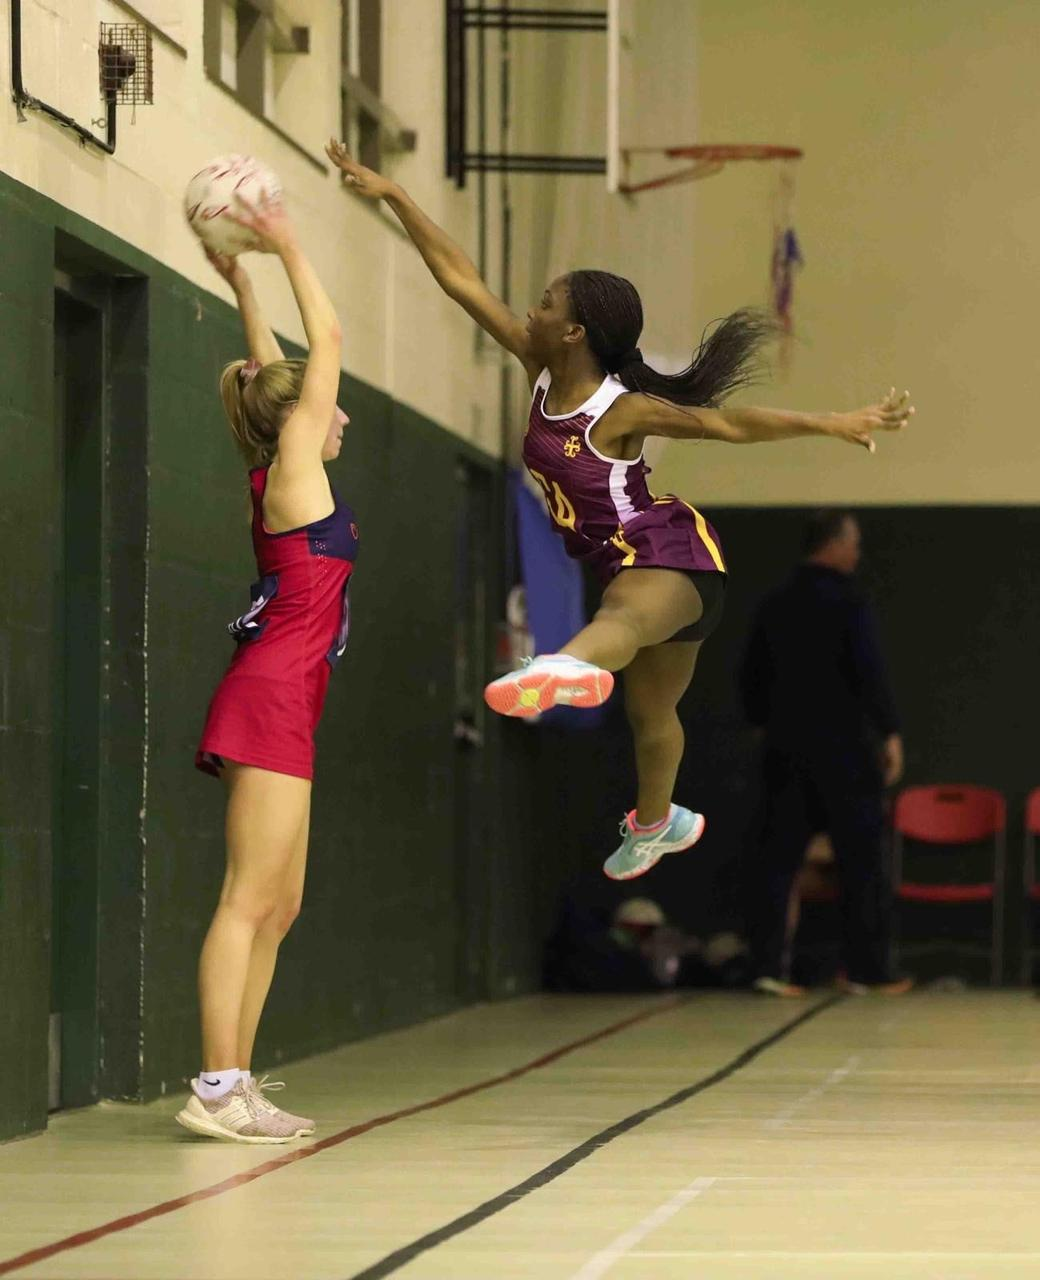 Sports uniform, Performing arts, Entertainment, Thigh, Sportswear, Dance, Shorts, Knee